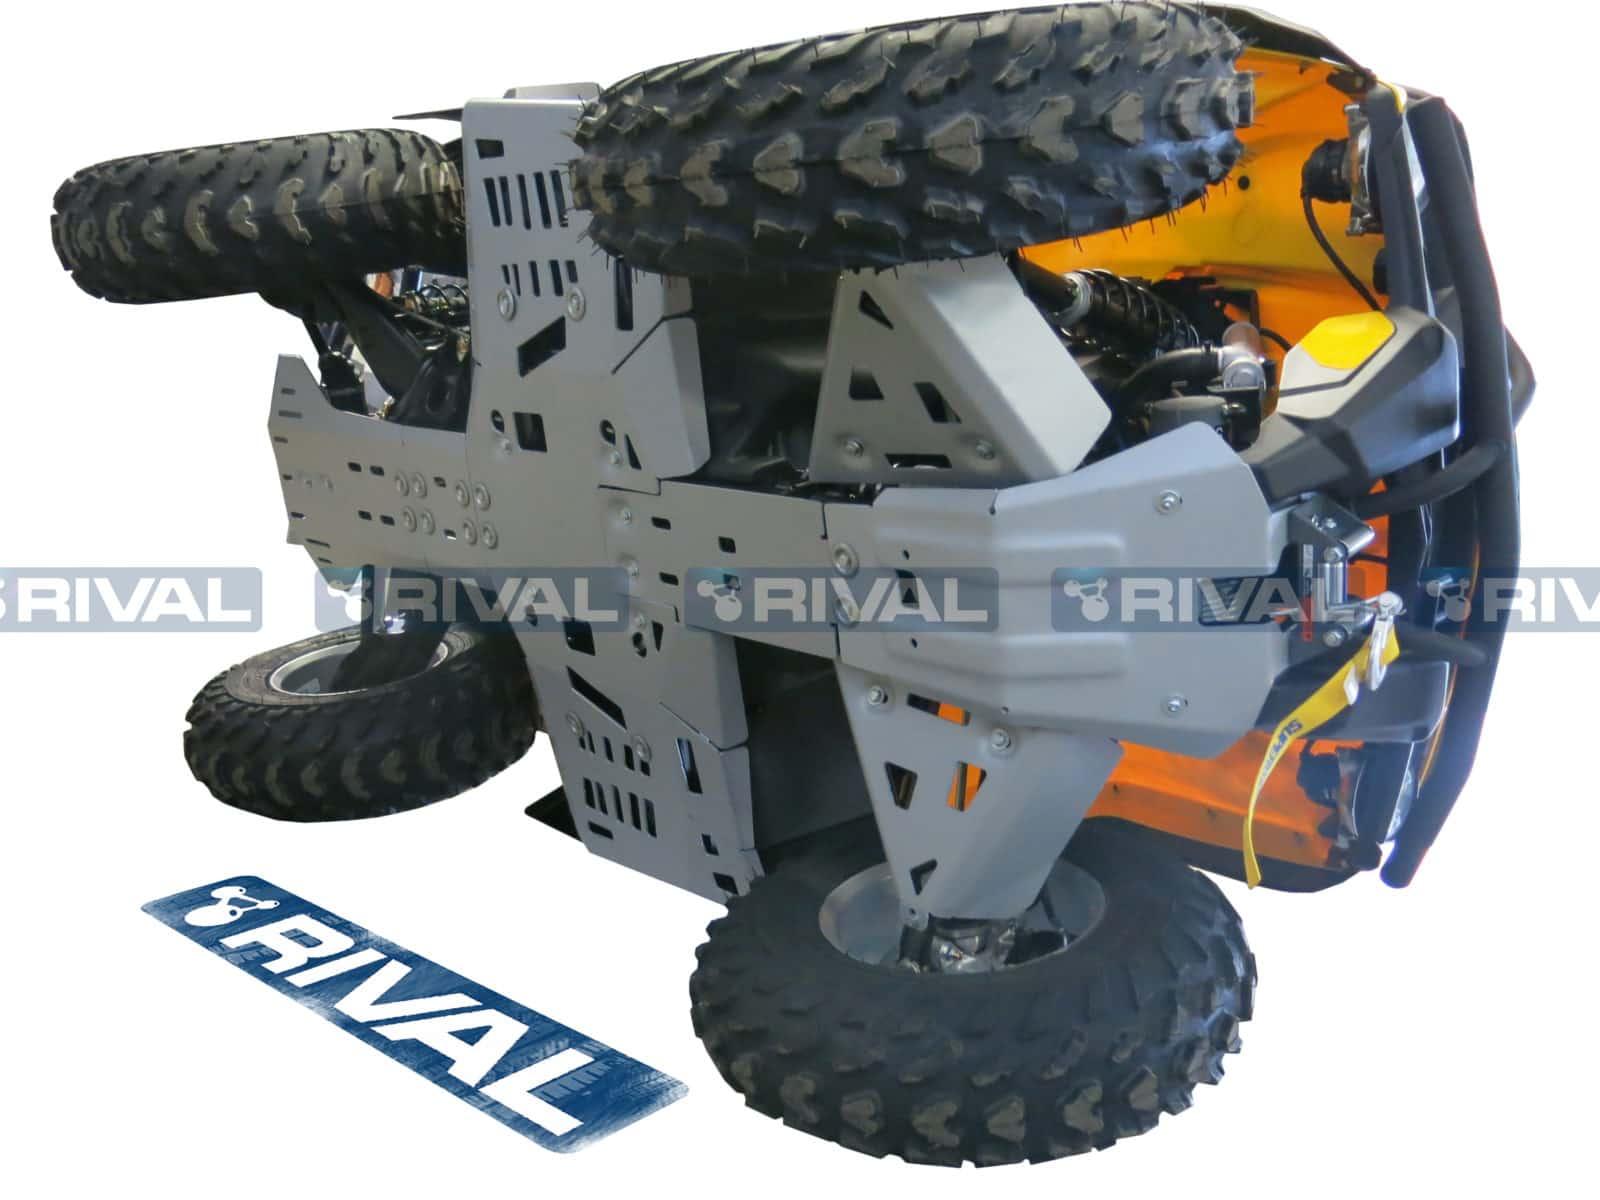 RV-2444-7220-1